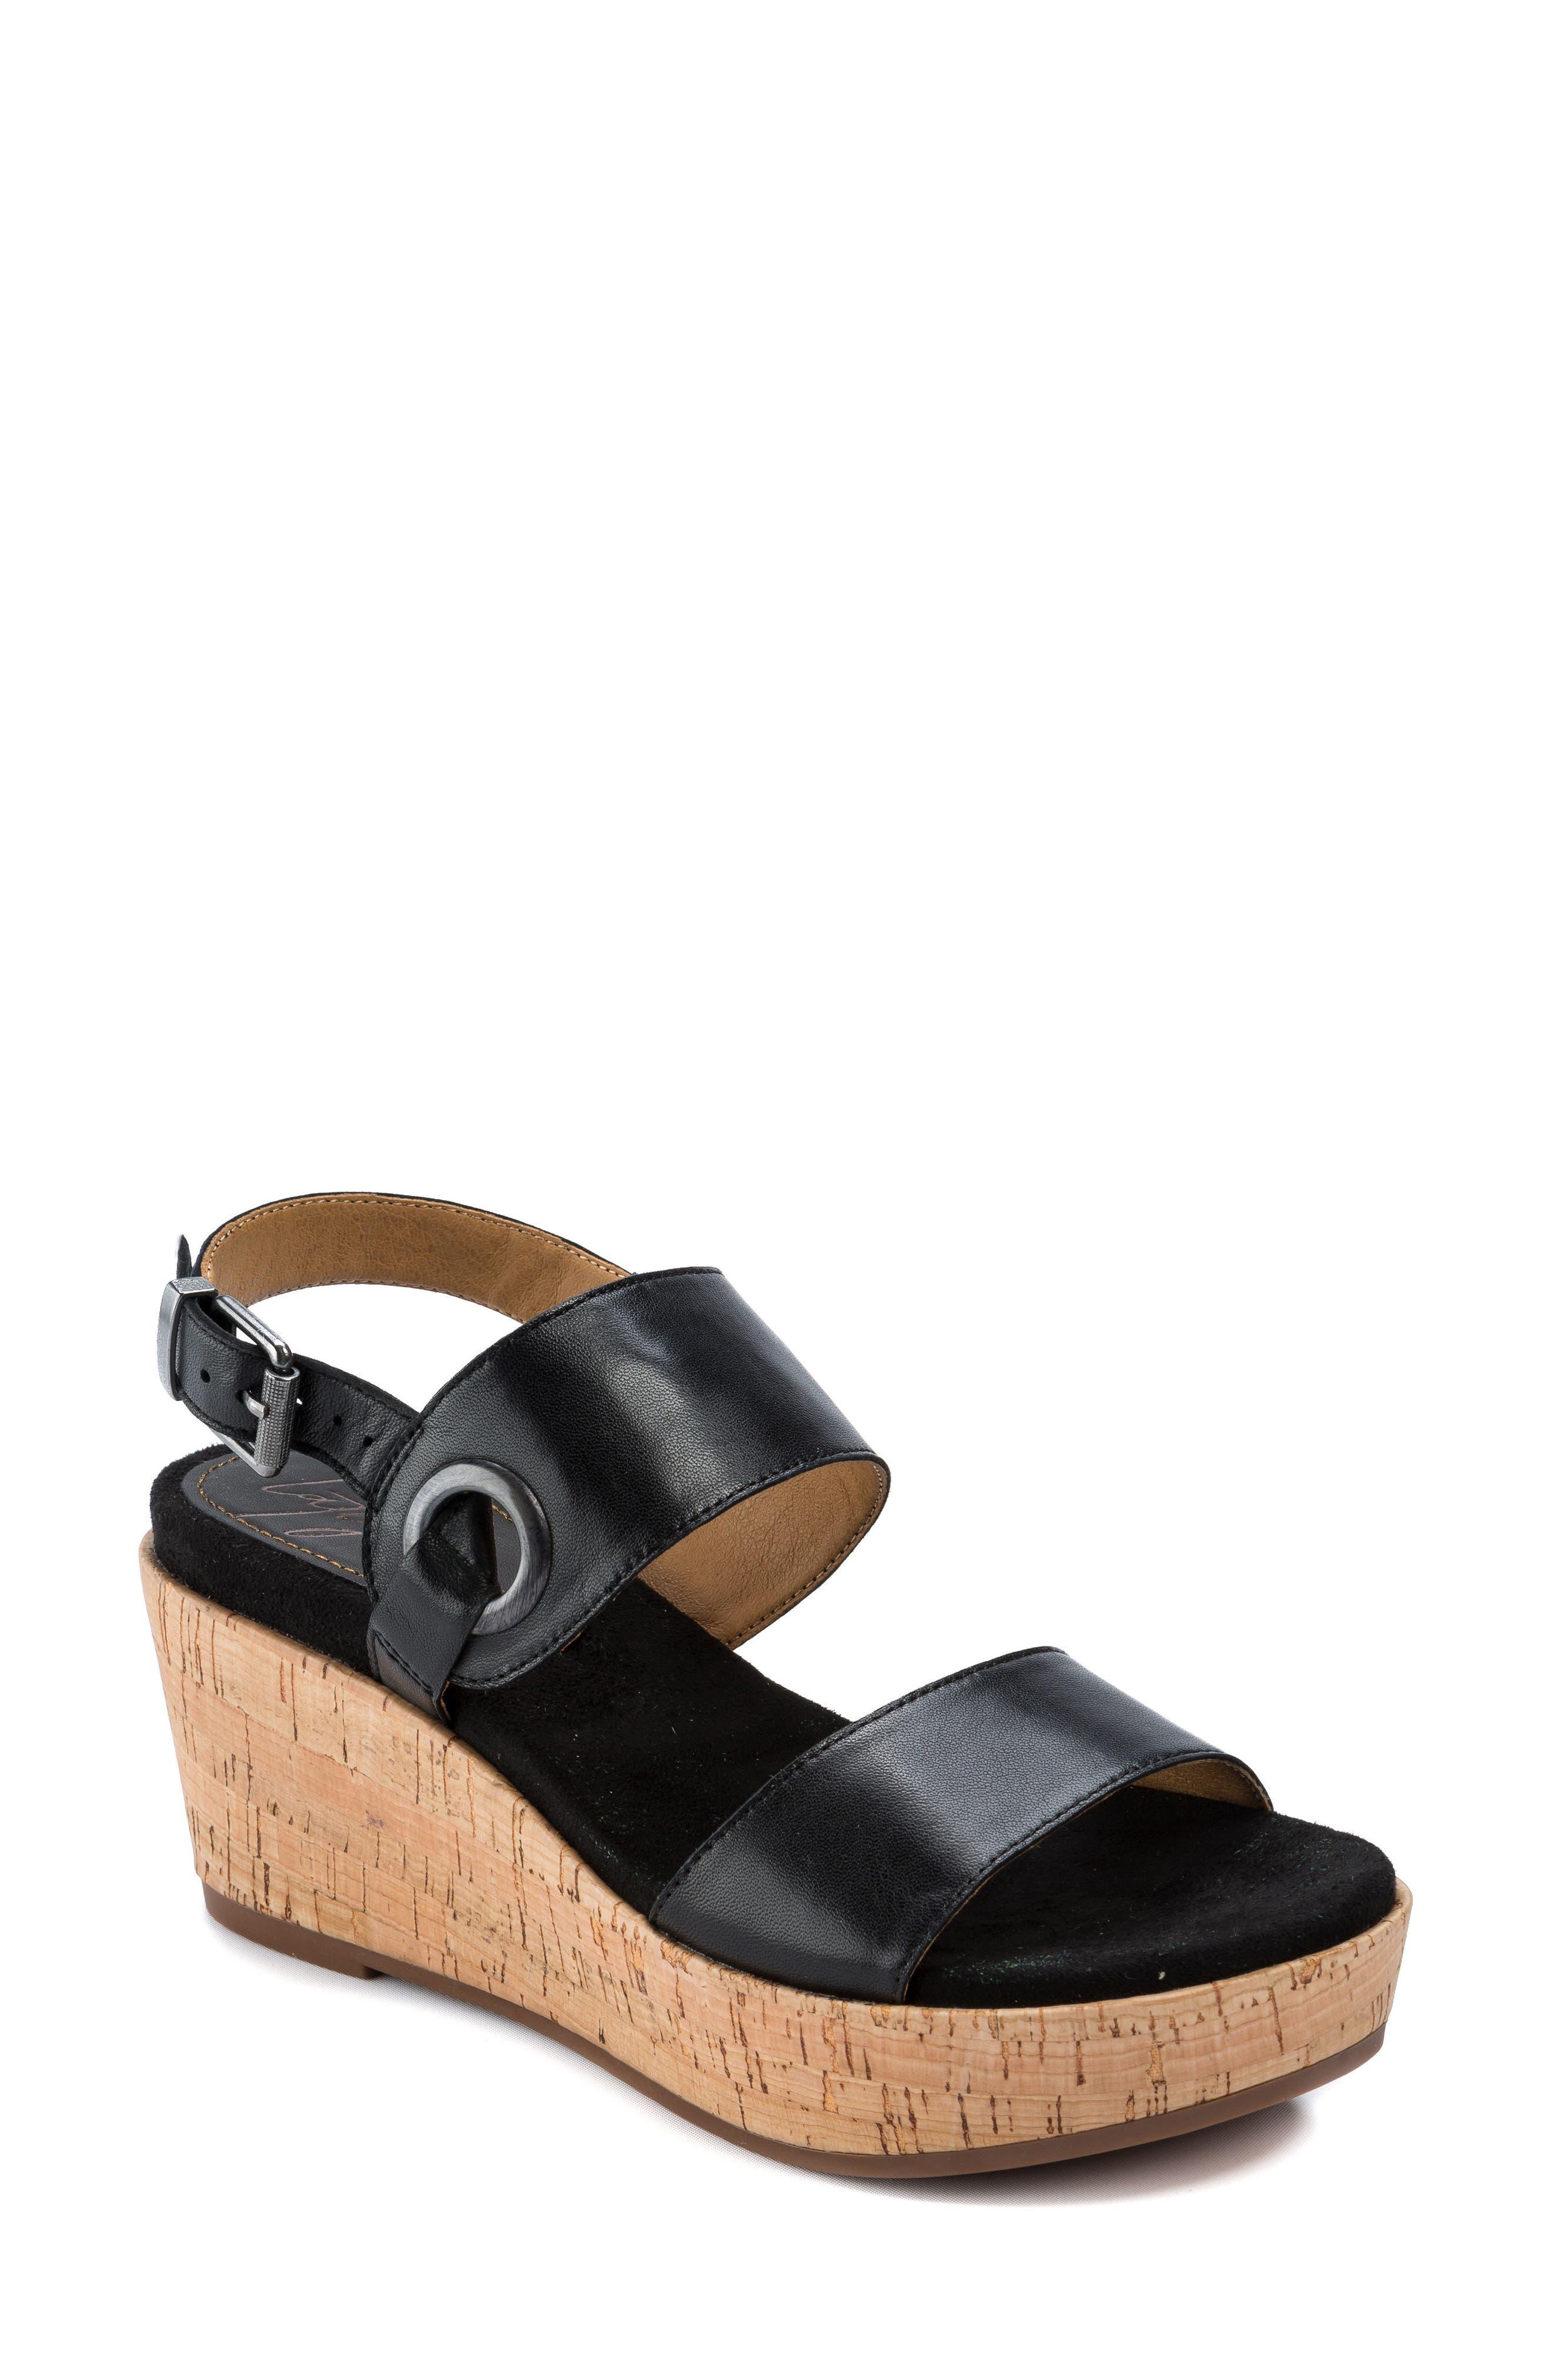 Lauren Platform Wedge Sandal,                         Main,                         color, 001